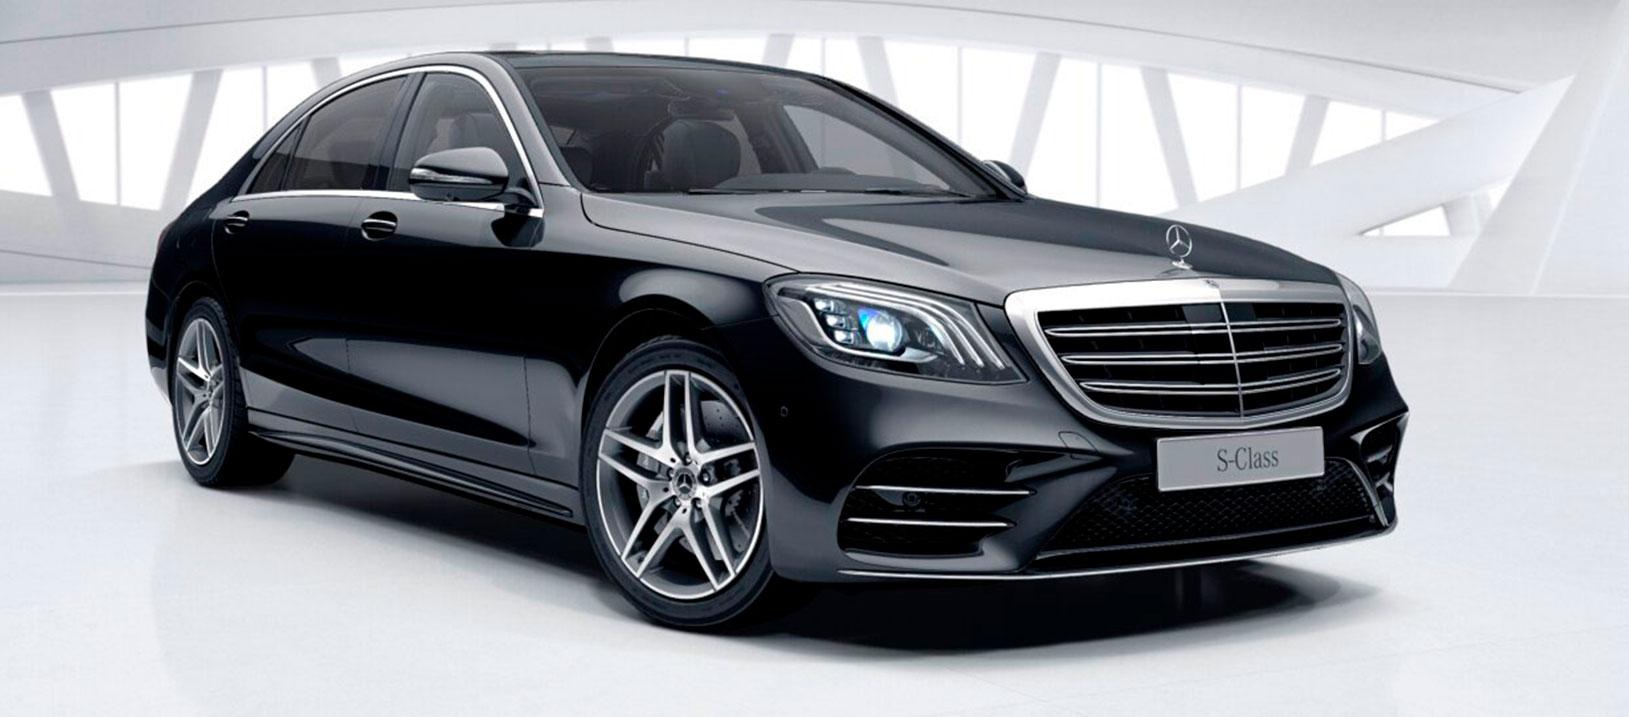 Mercedes-Benz S 400 d 4MATIC long 52600206